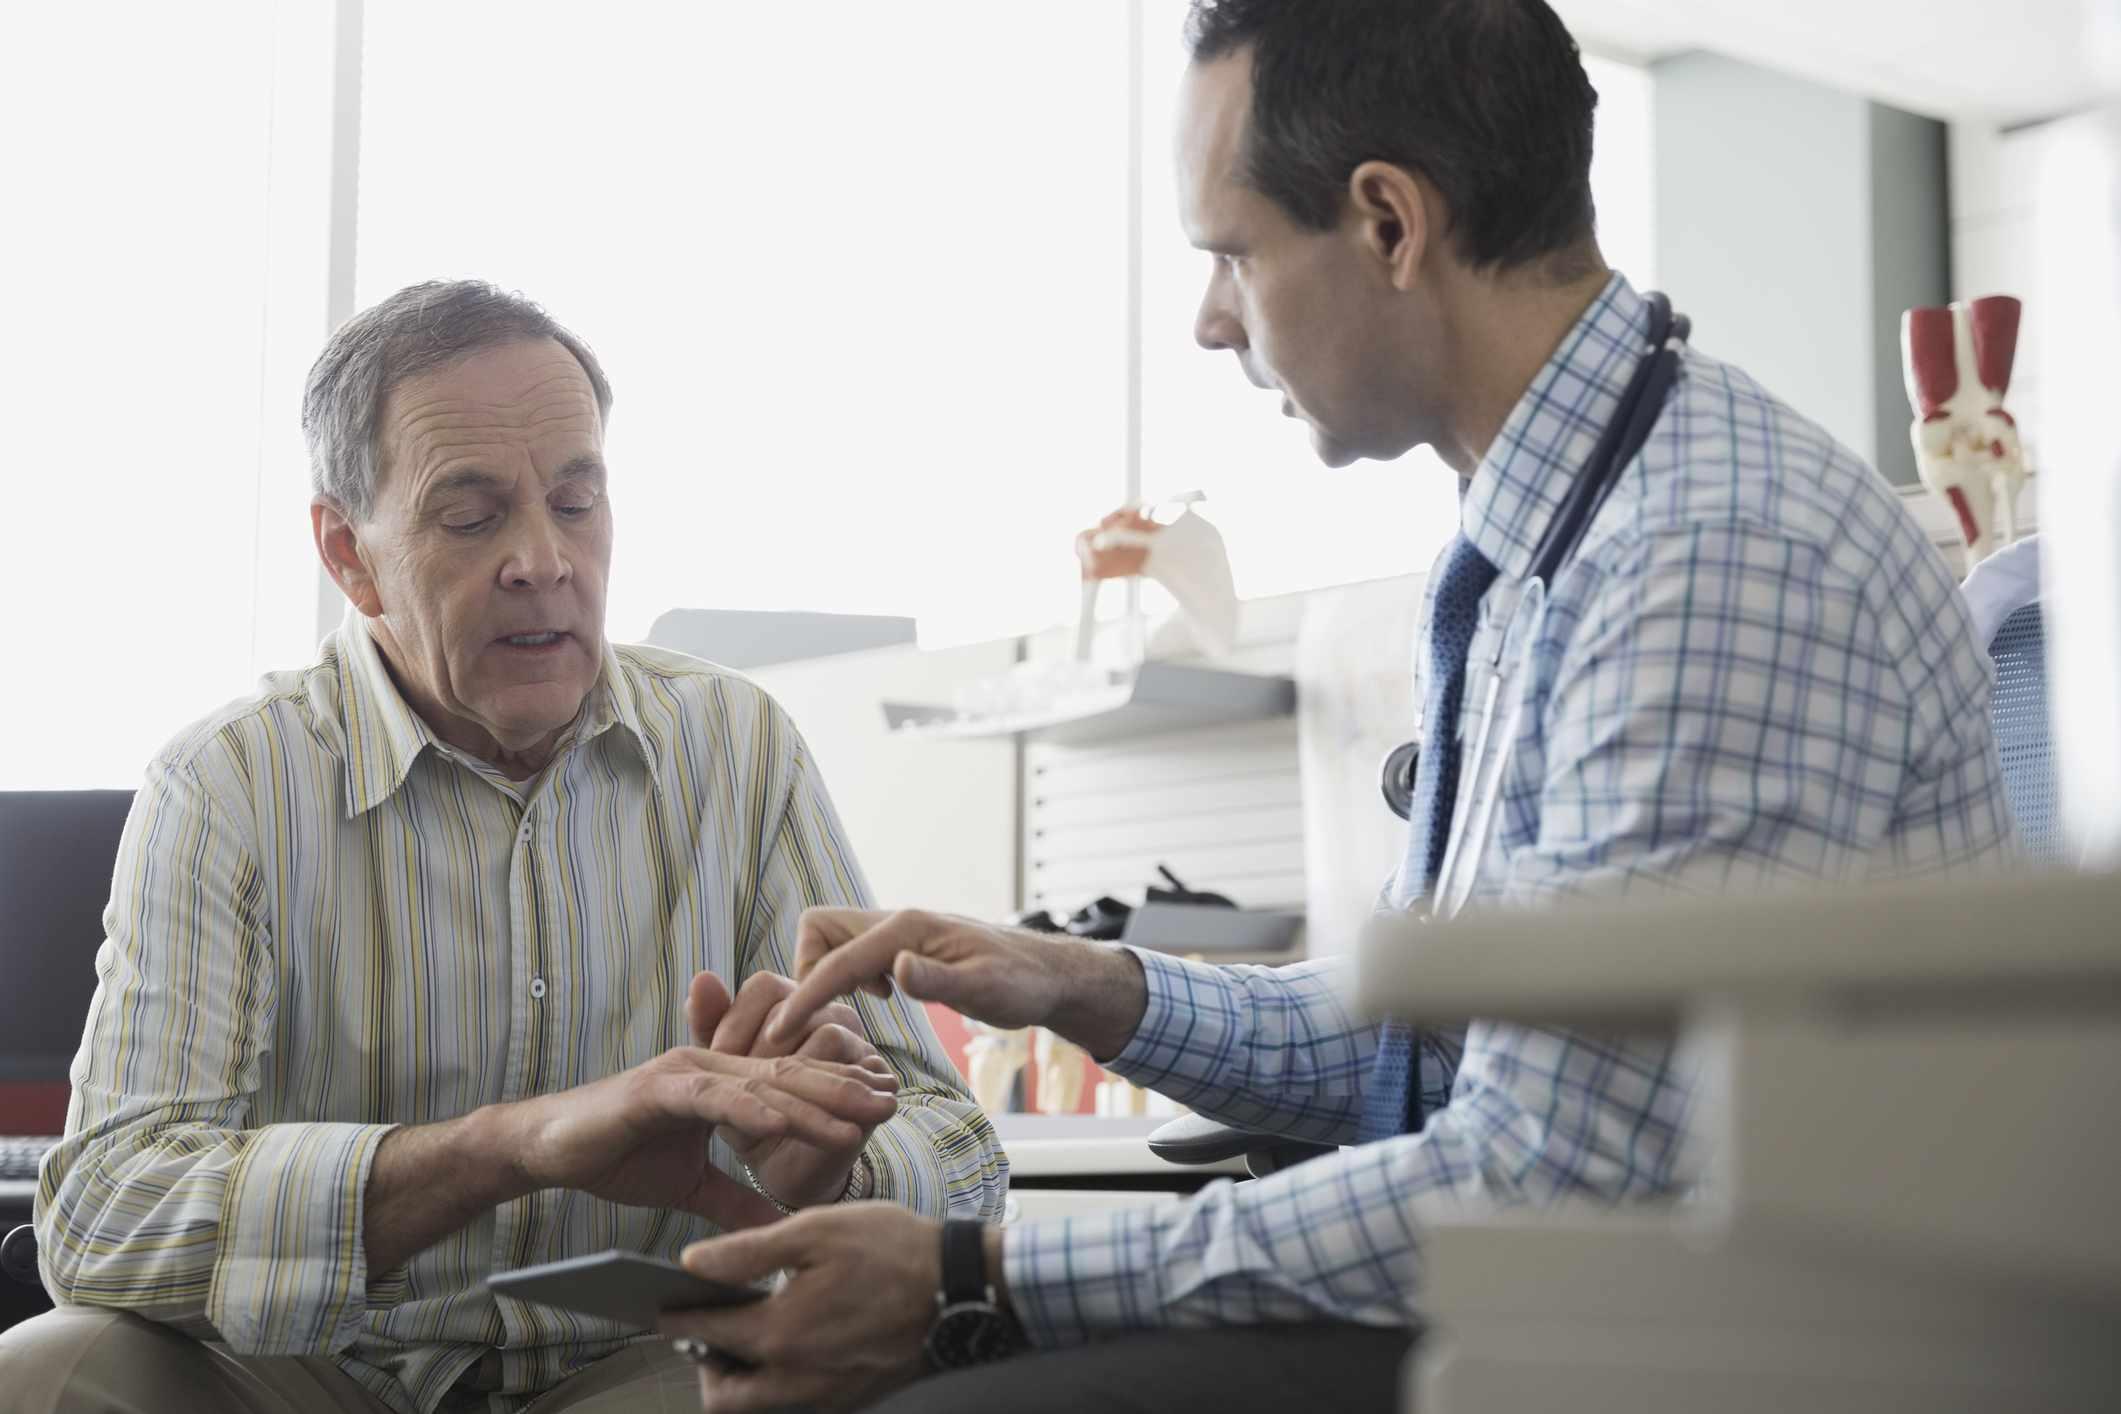 Doctor examining senior patient's hand in office